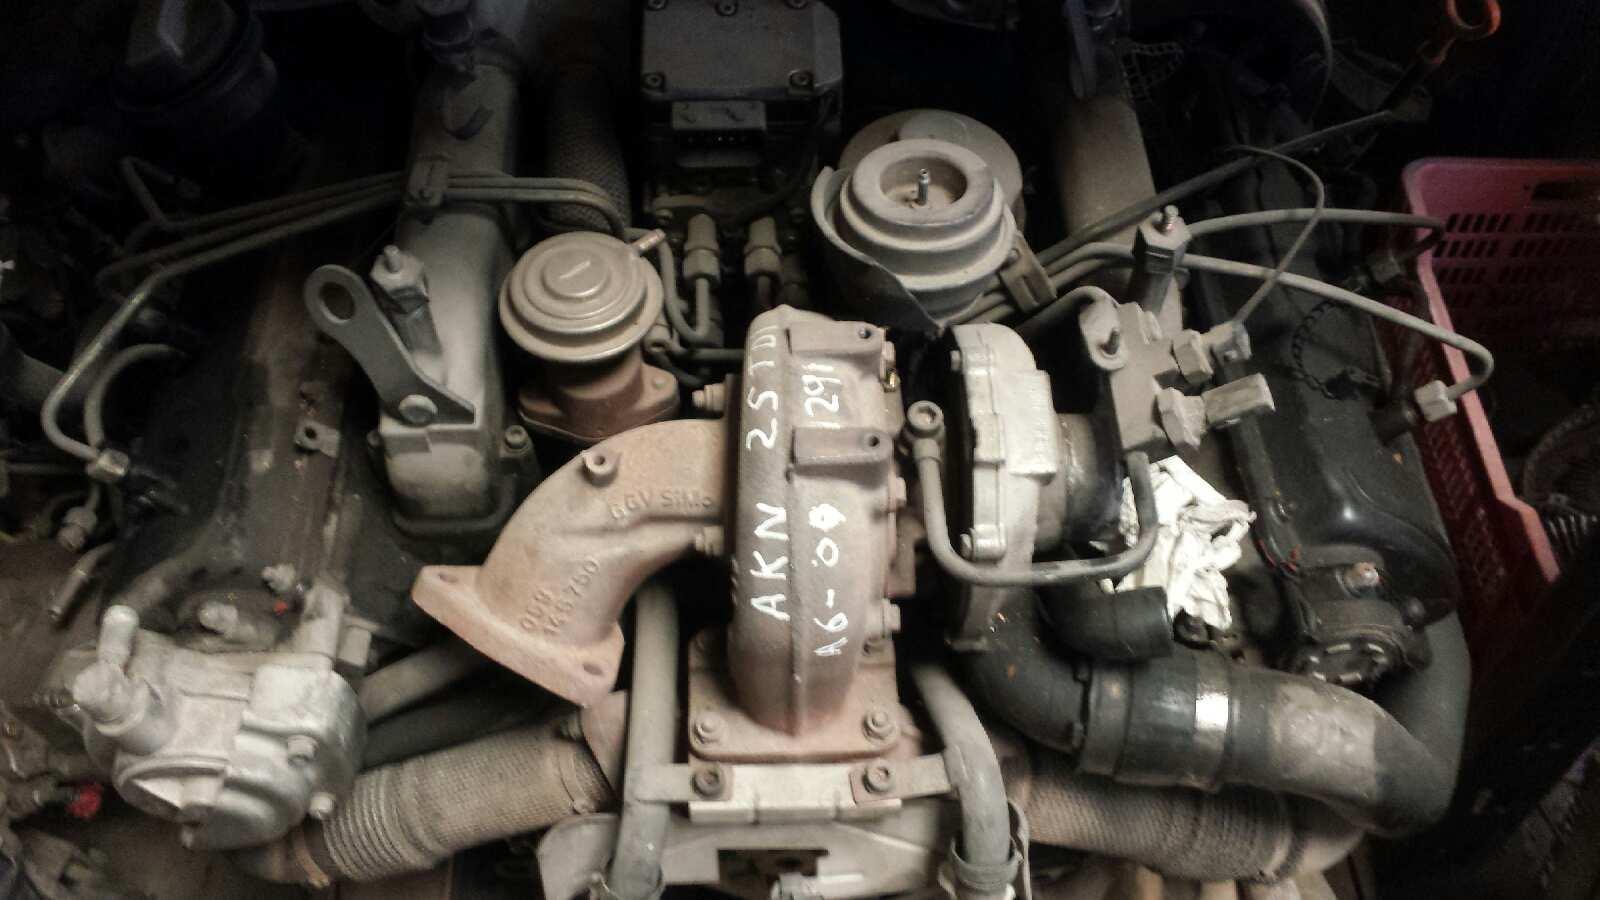 Motor completo de Audi   A6 Berlina 2.5 Tdi   AKN